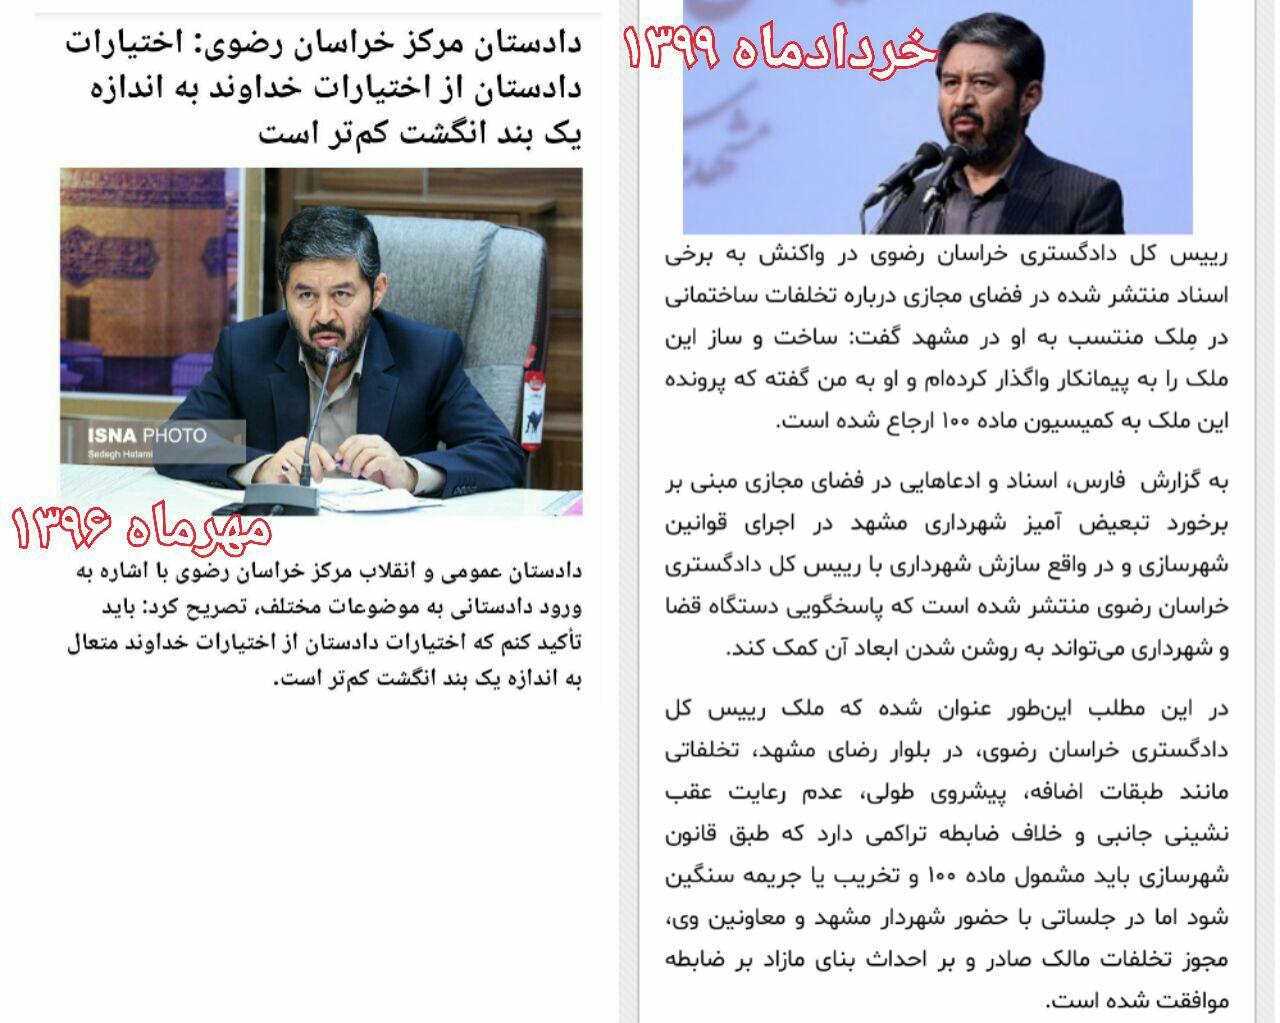 IMG 20200613 085929 201 واکنش رییس دادگستری خراسان رضوی به تخلفات ساخت و ساز در ملک شخصی اش